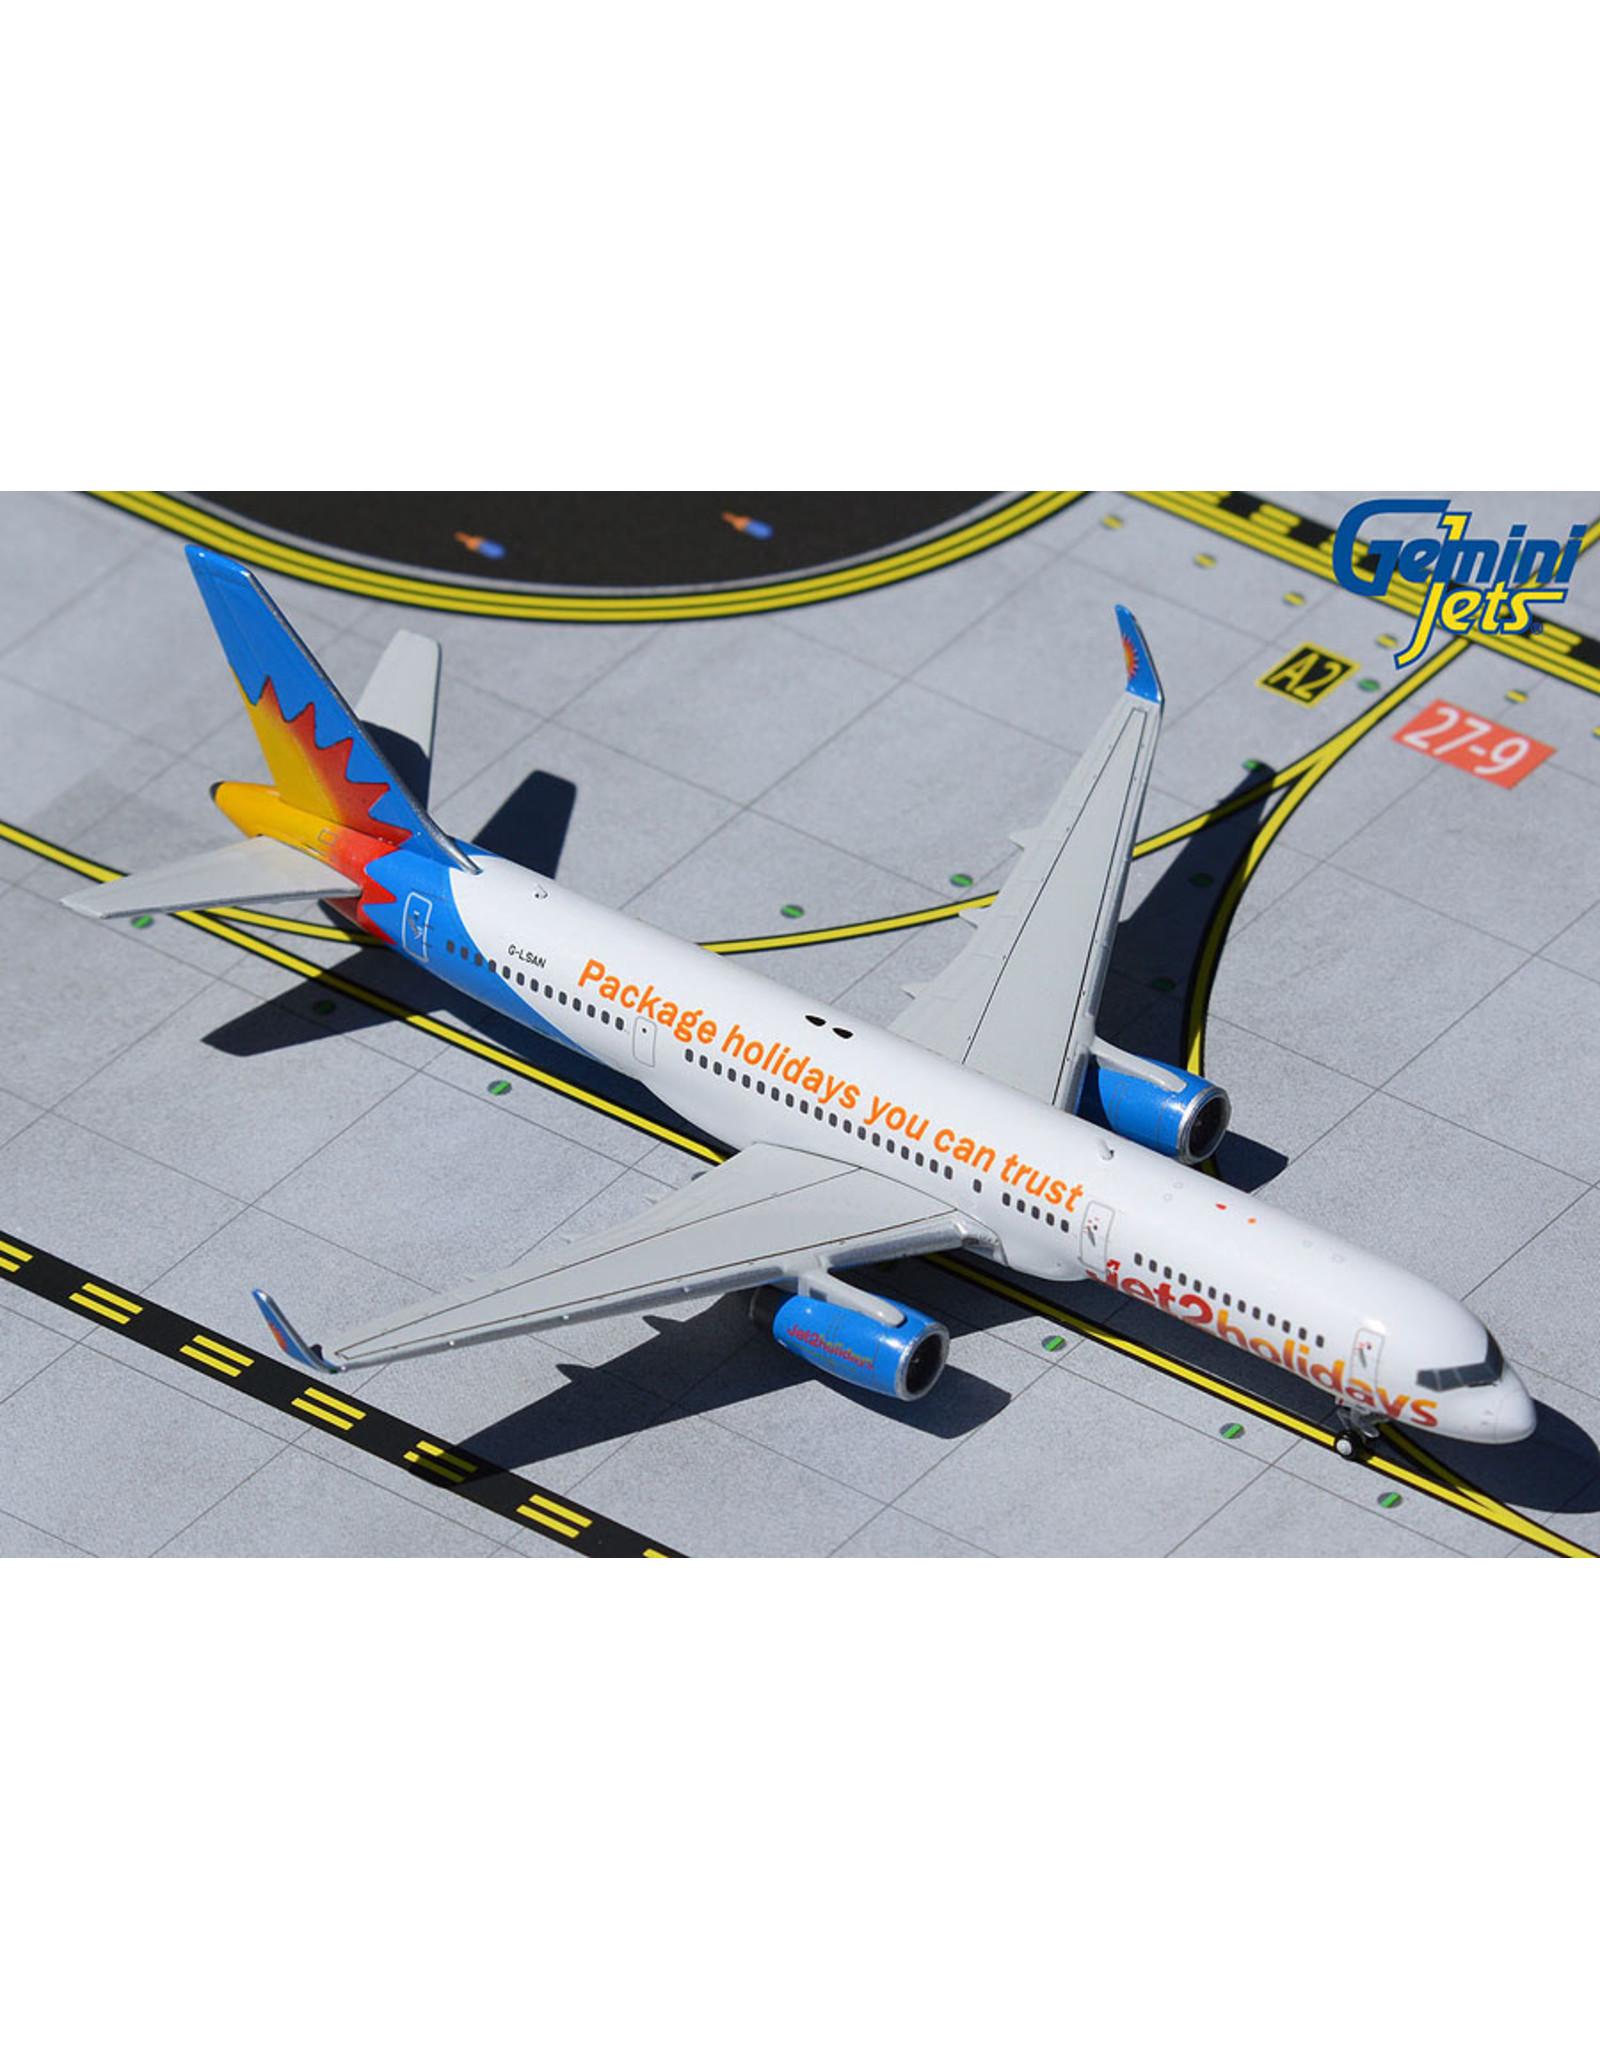 Gemini Gem4 Jet2.com 757-200 G-LSAN